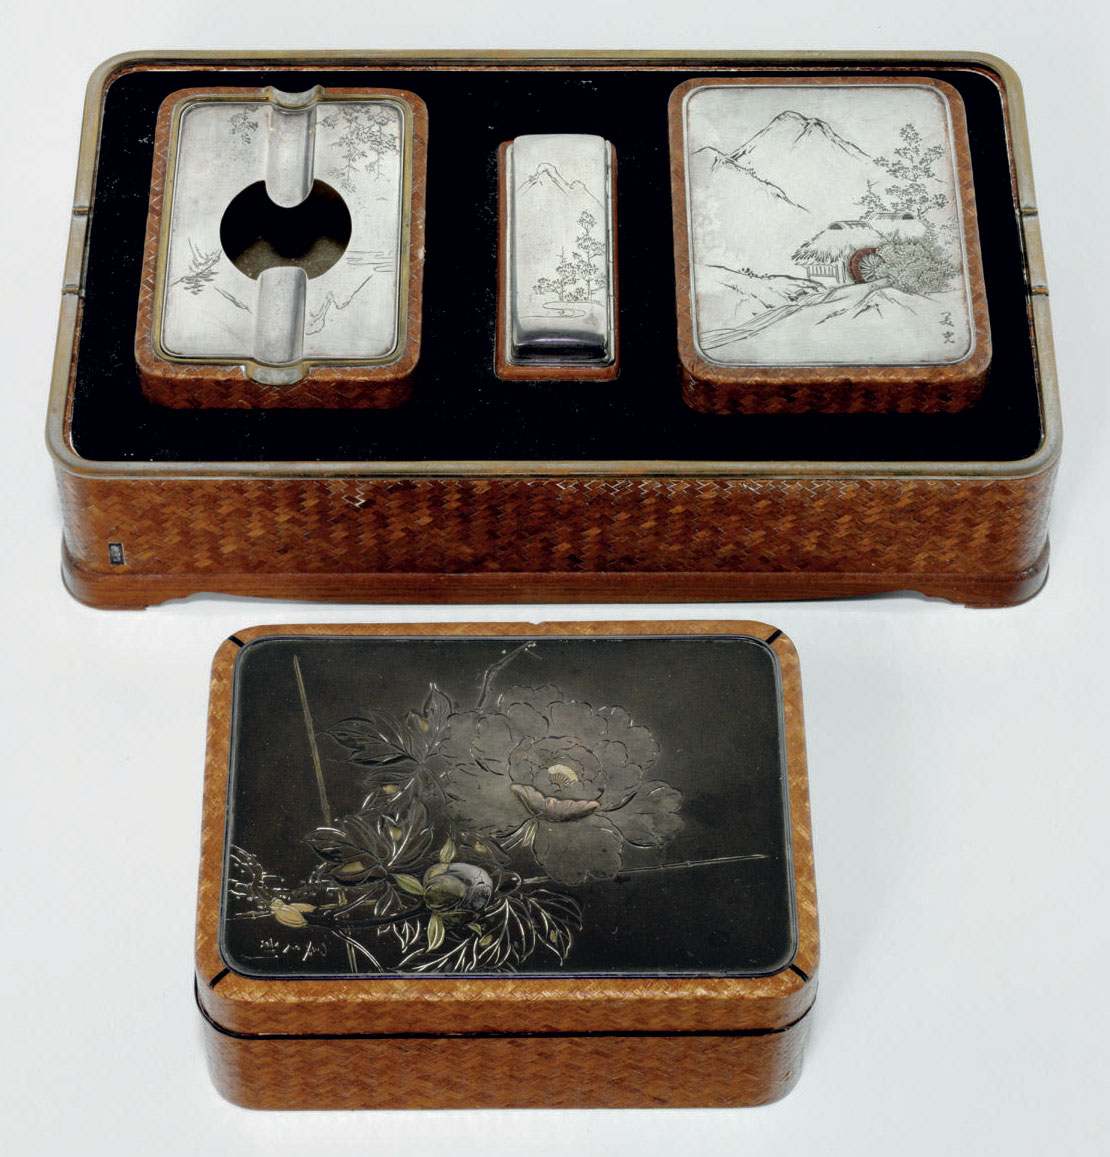 A silver-mounted smoking set a